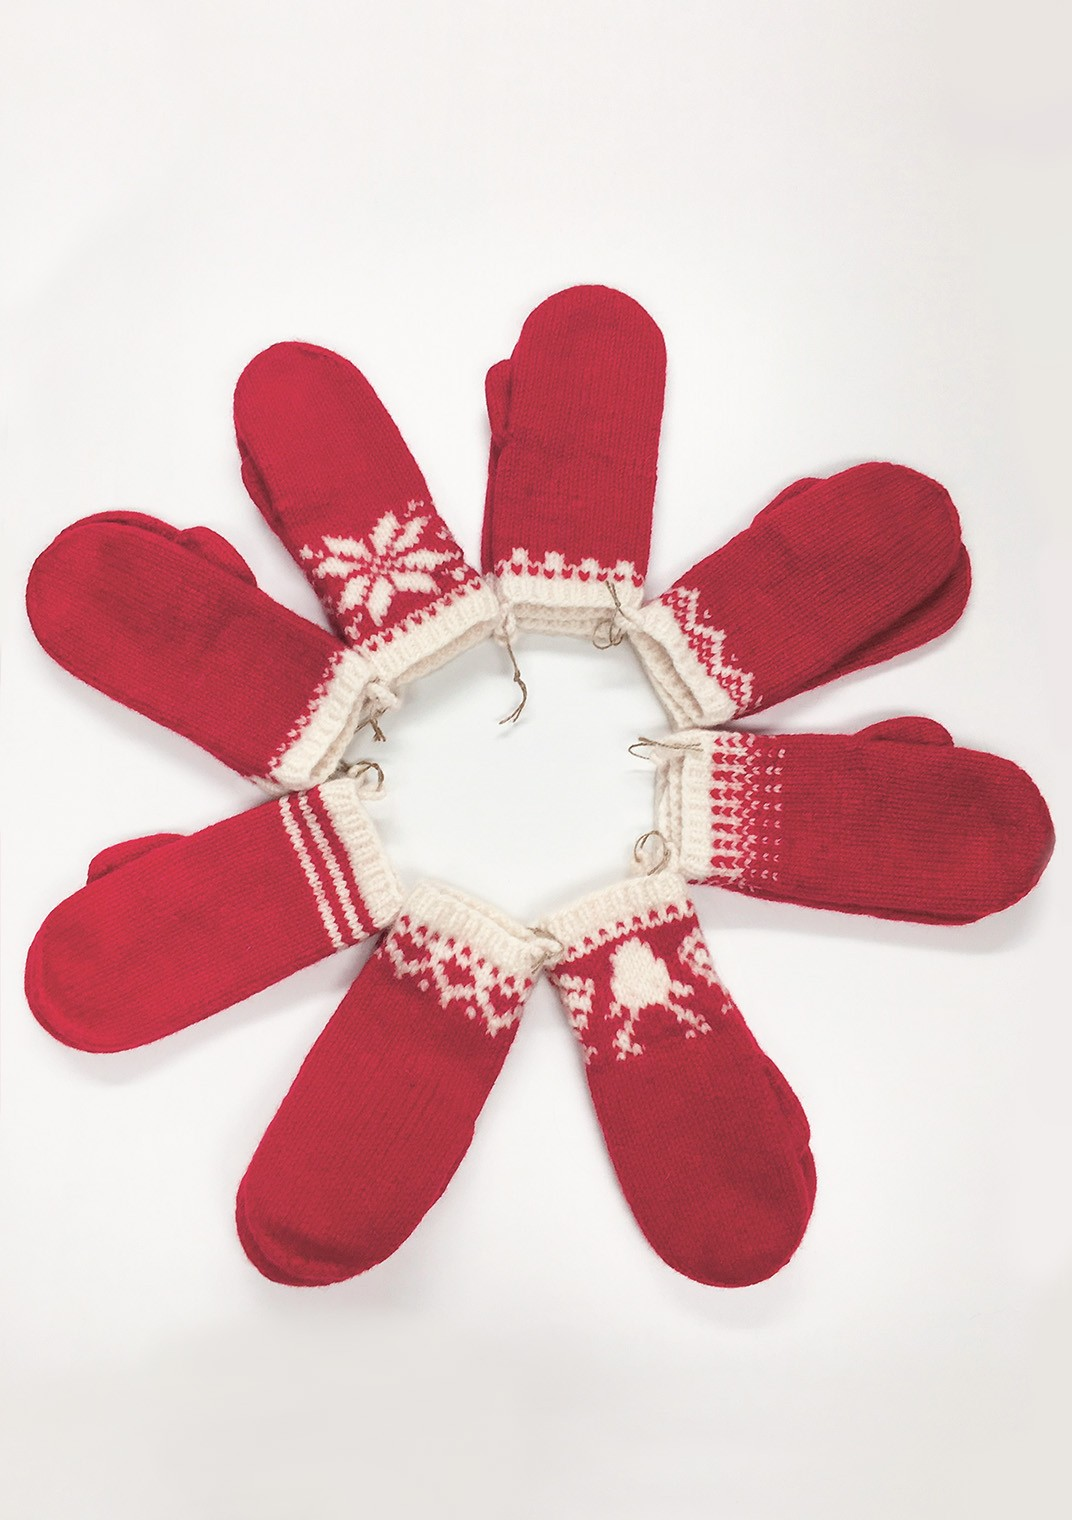 Christmas Mittens - Finnish pattern